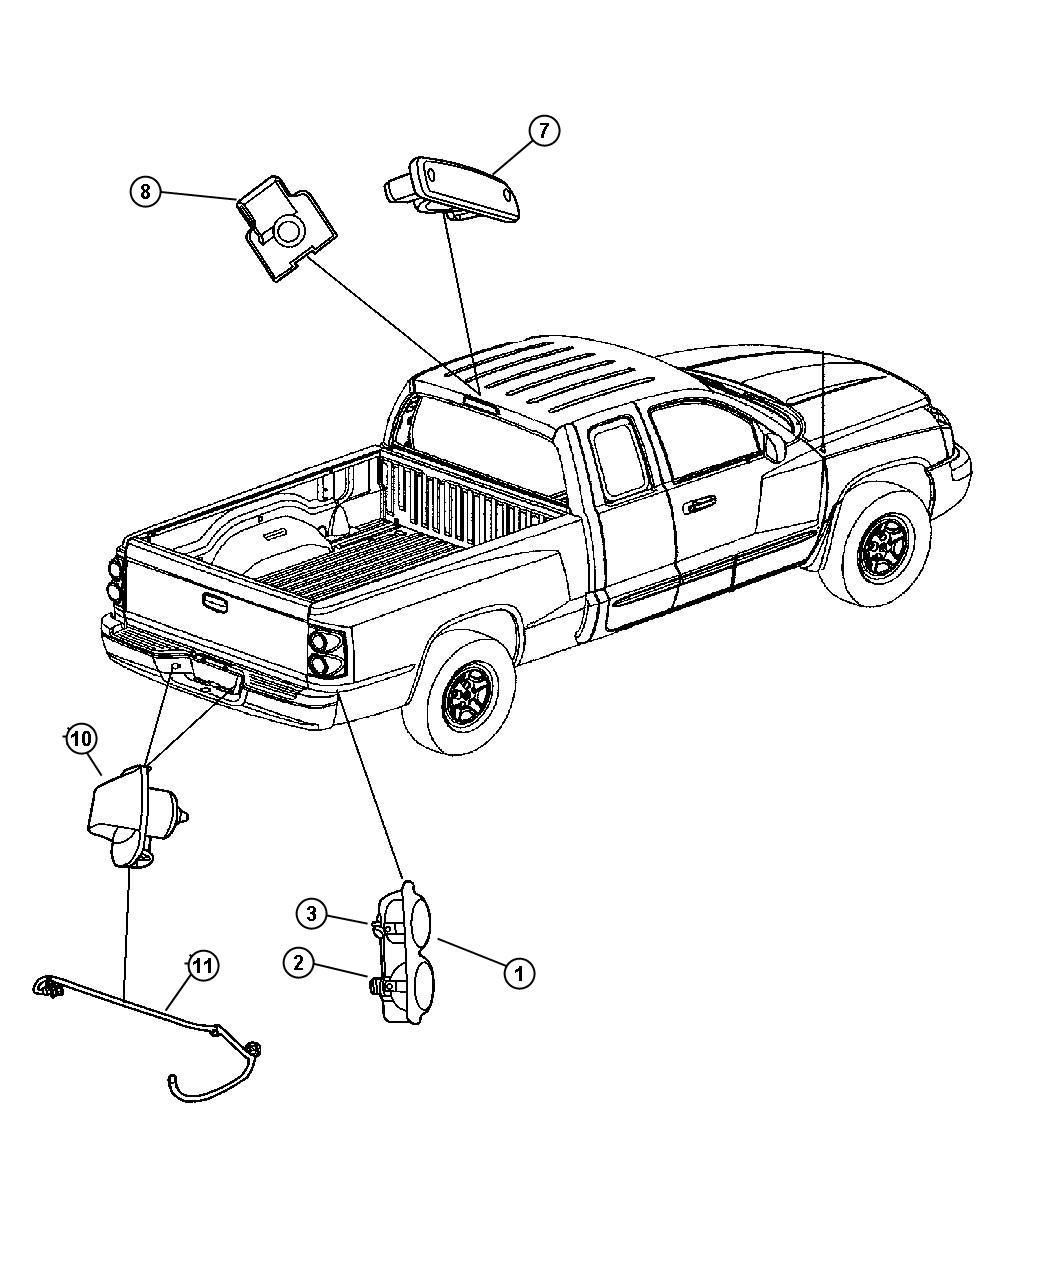 Jeep Wrangler Seal Socket Back Up Lamp Export